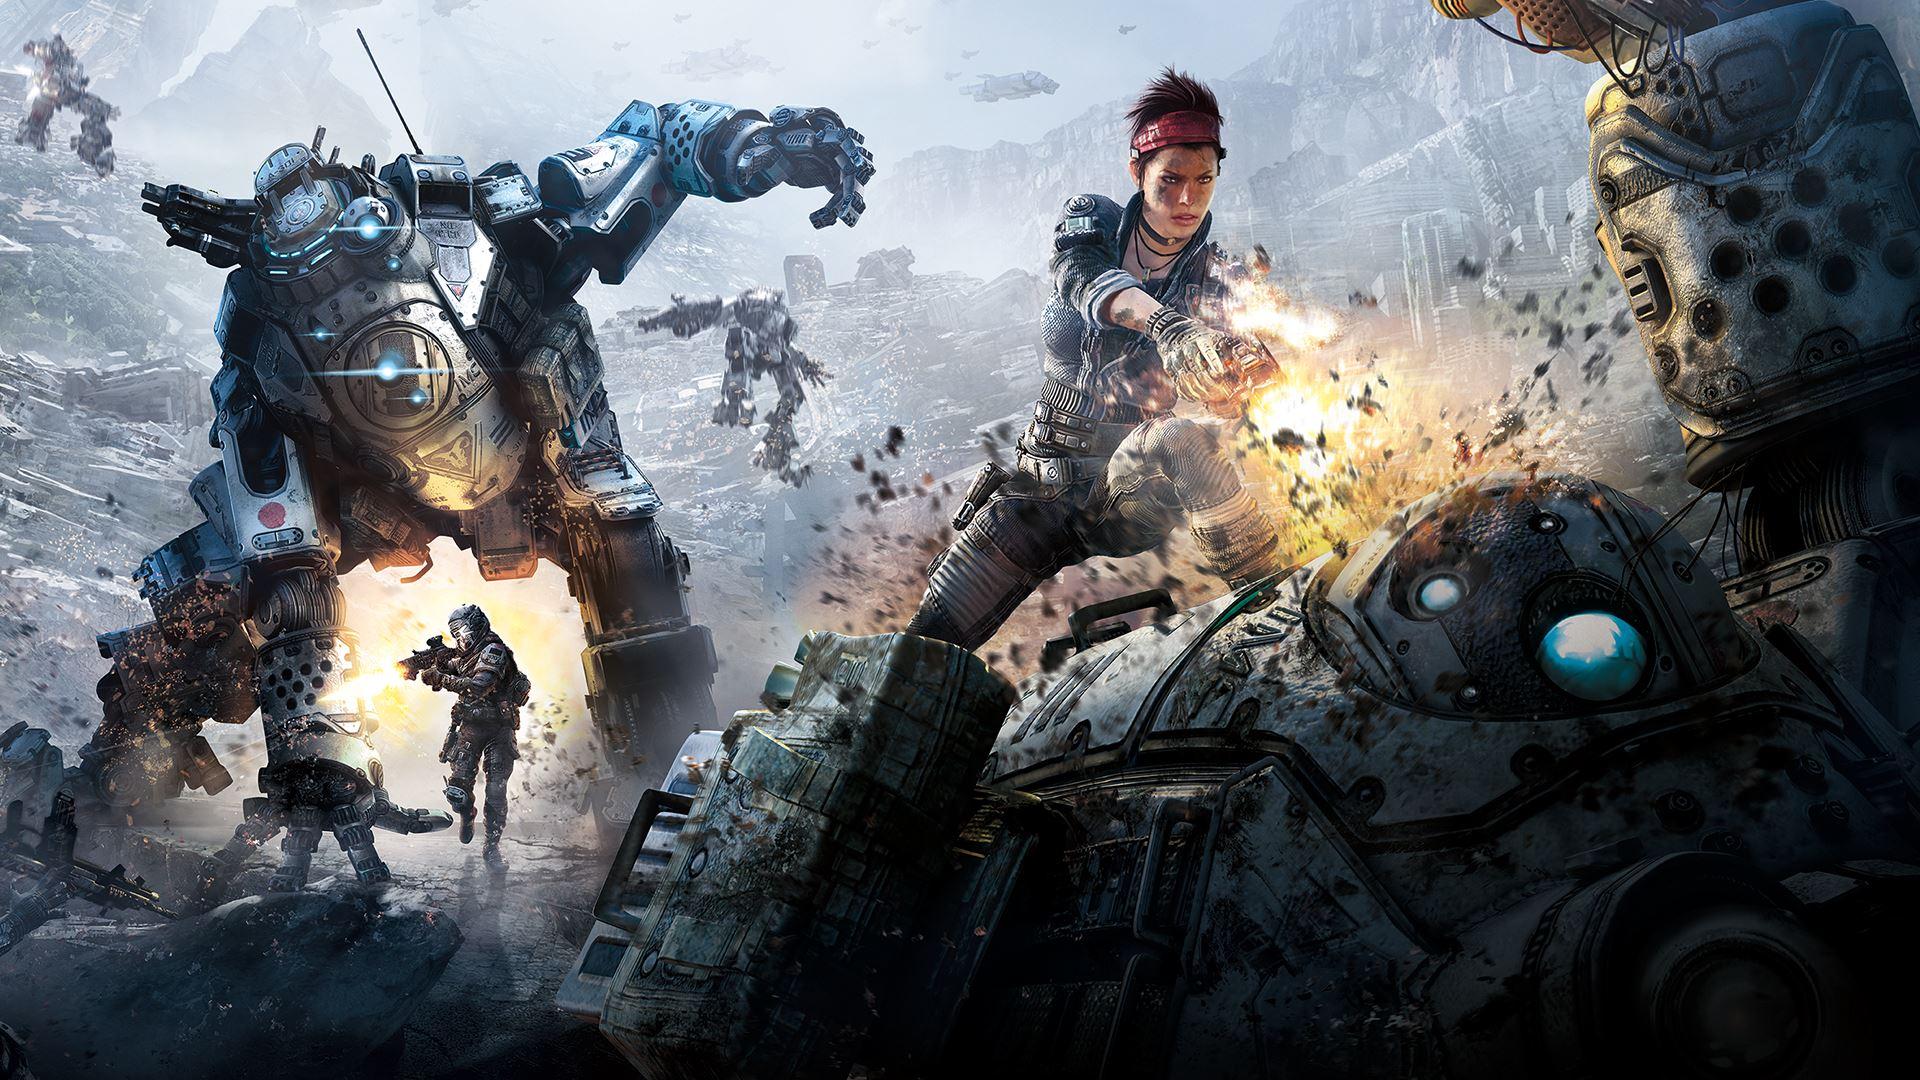 gamescom 2016: Titanfall 2 beta test weekends revealed